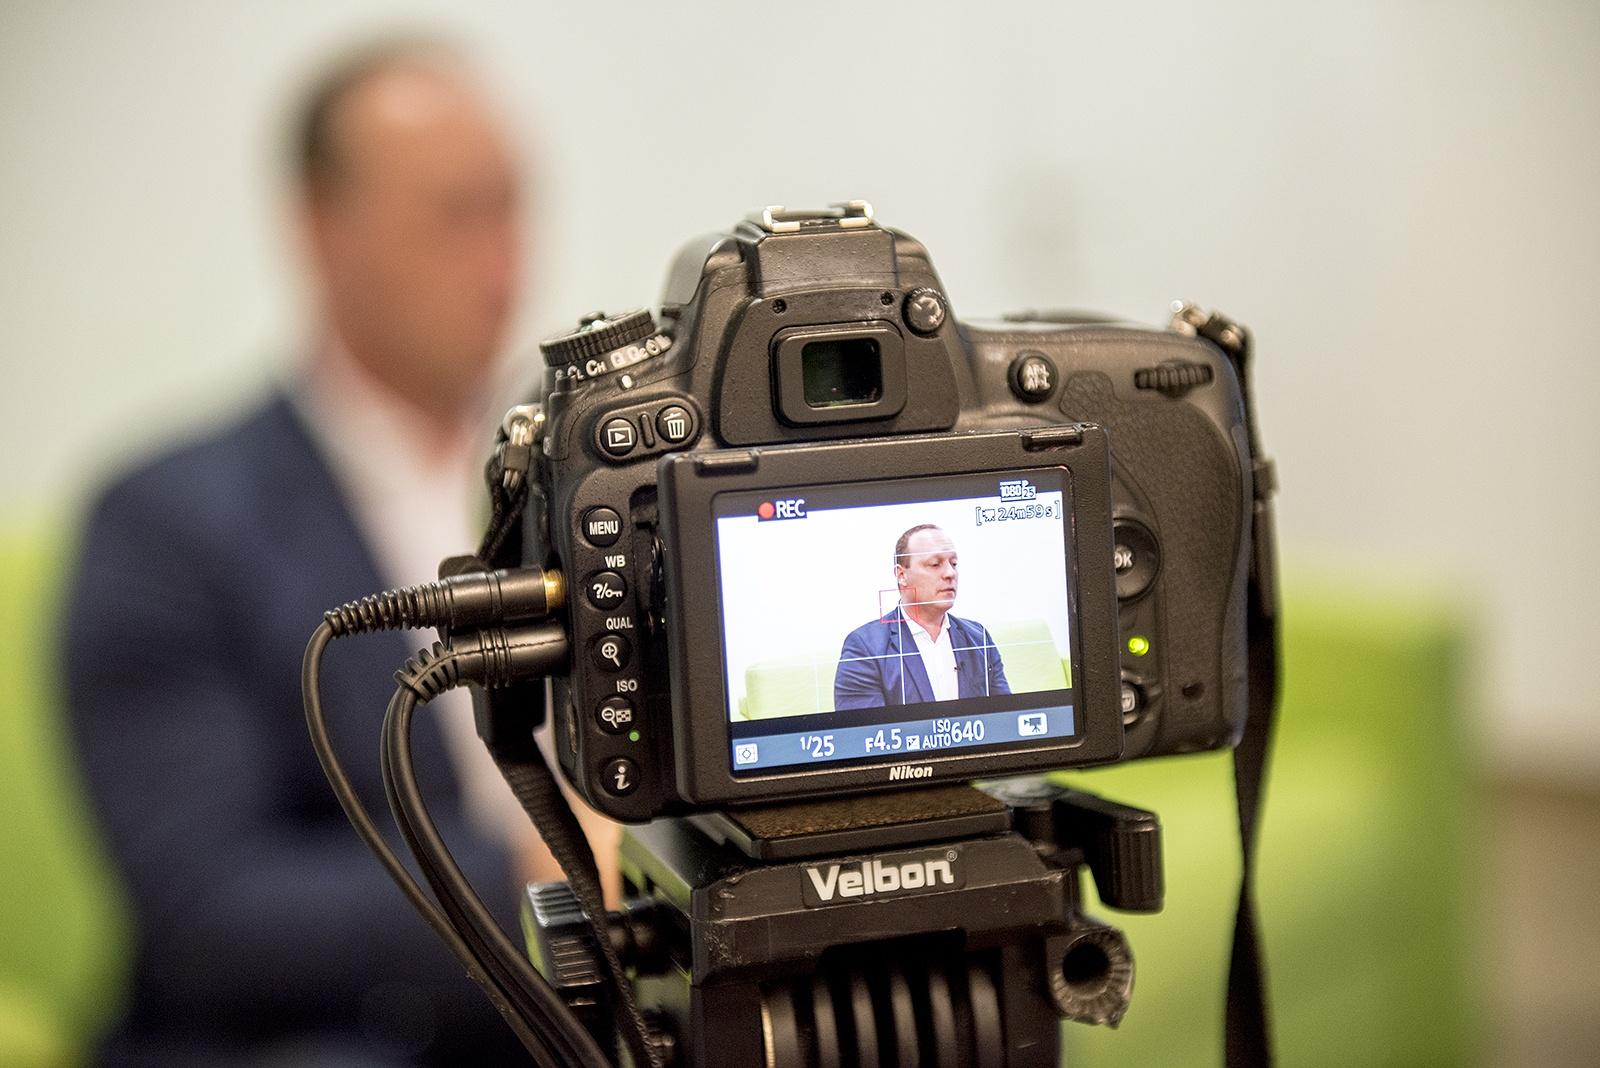 MFG Interviews Image